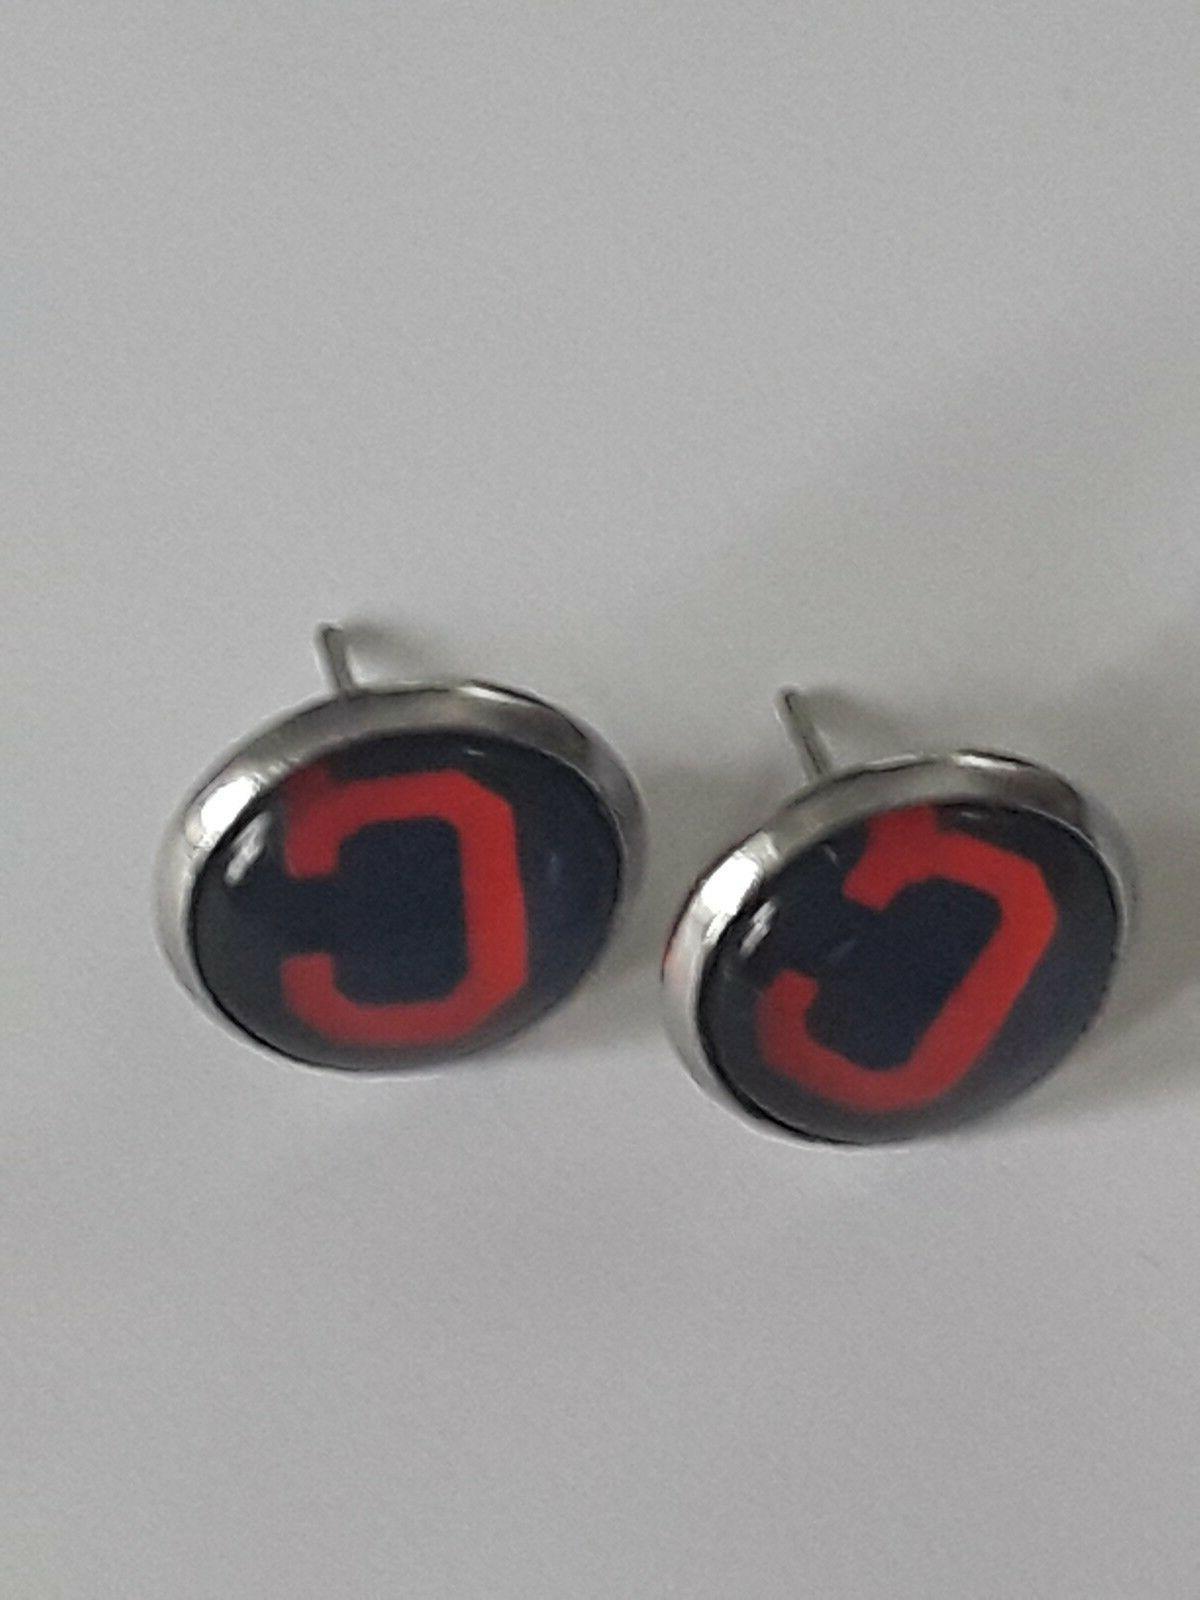 mlb cleveland indians 12mm stud earring set